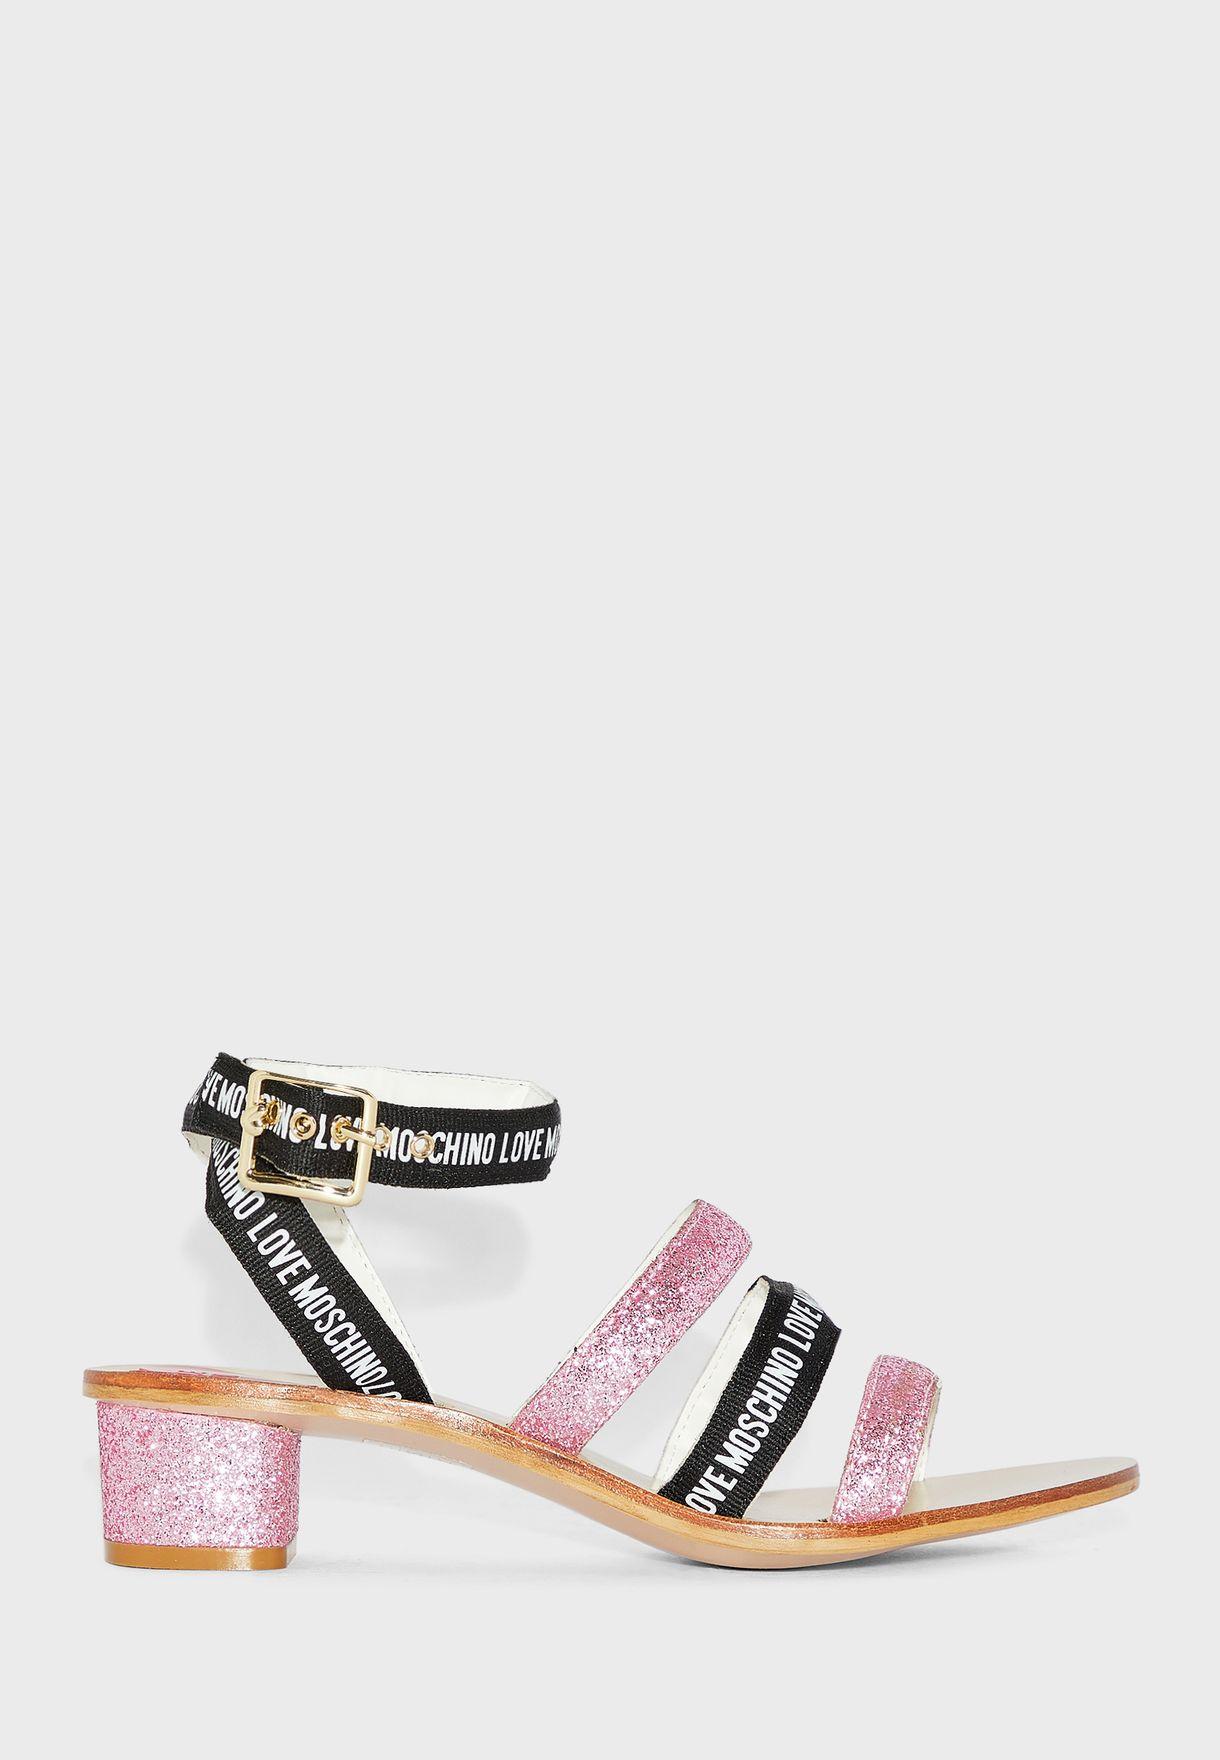 Multi Strap Low Heel Sandal - Rosa